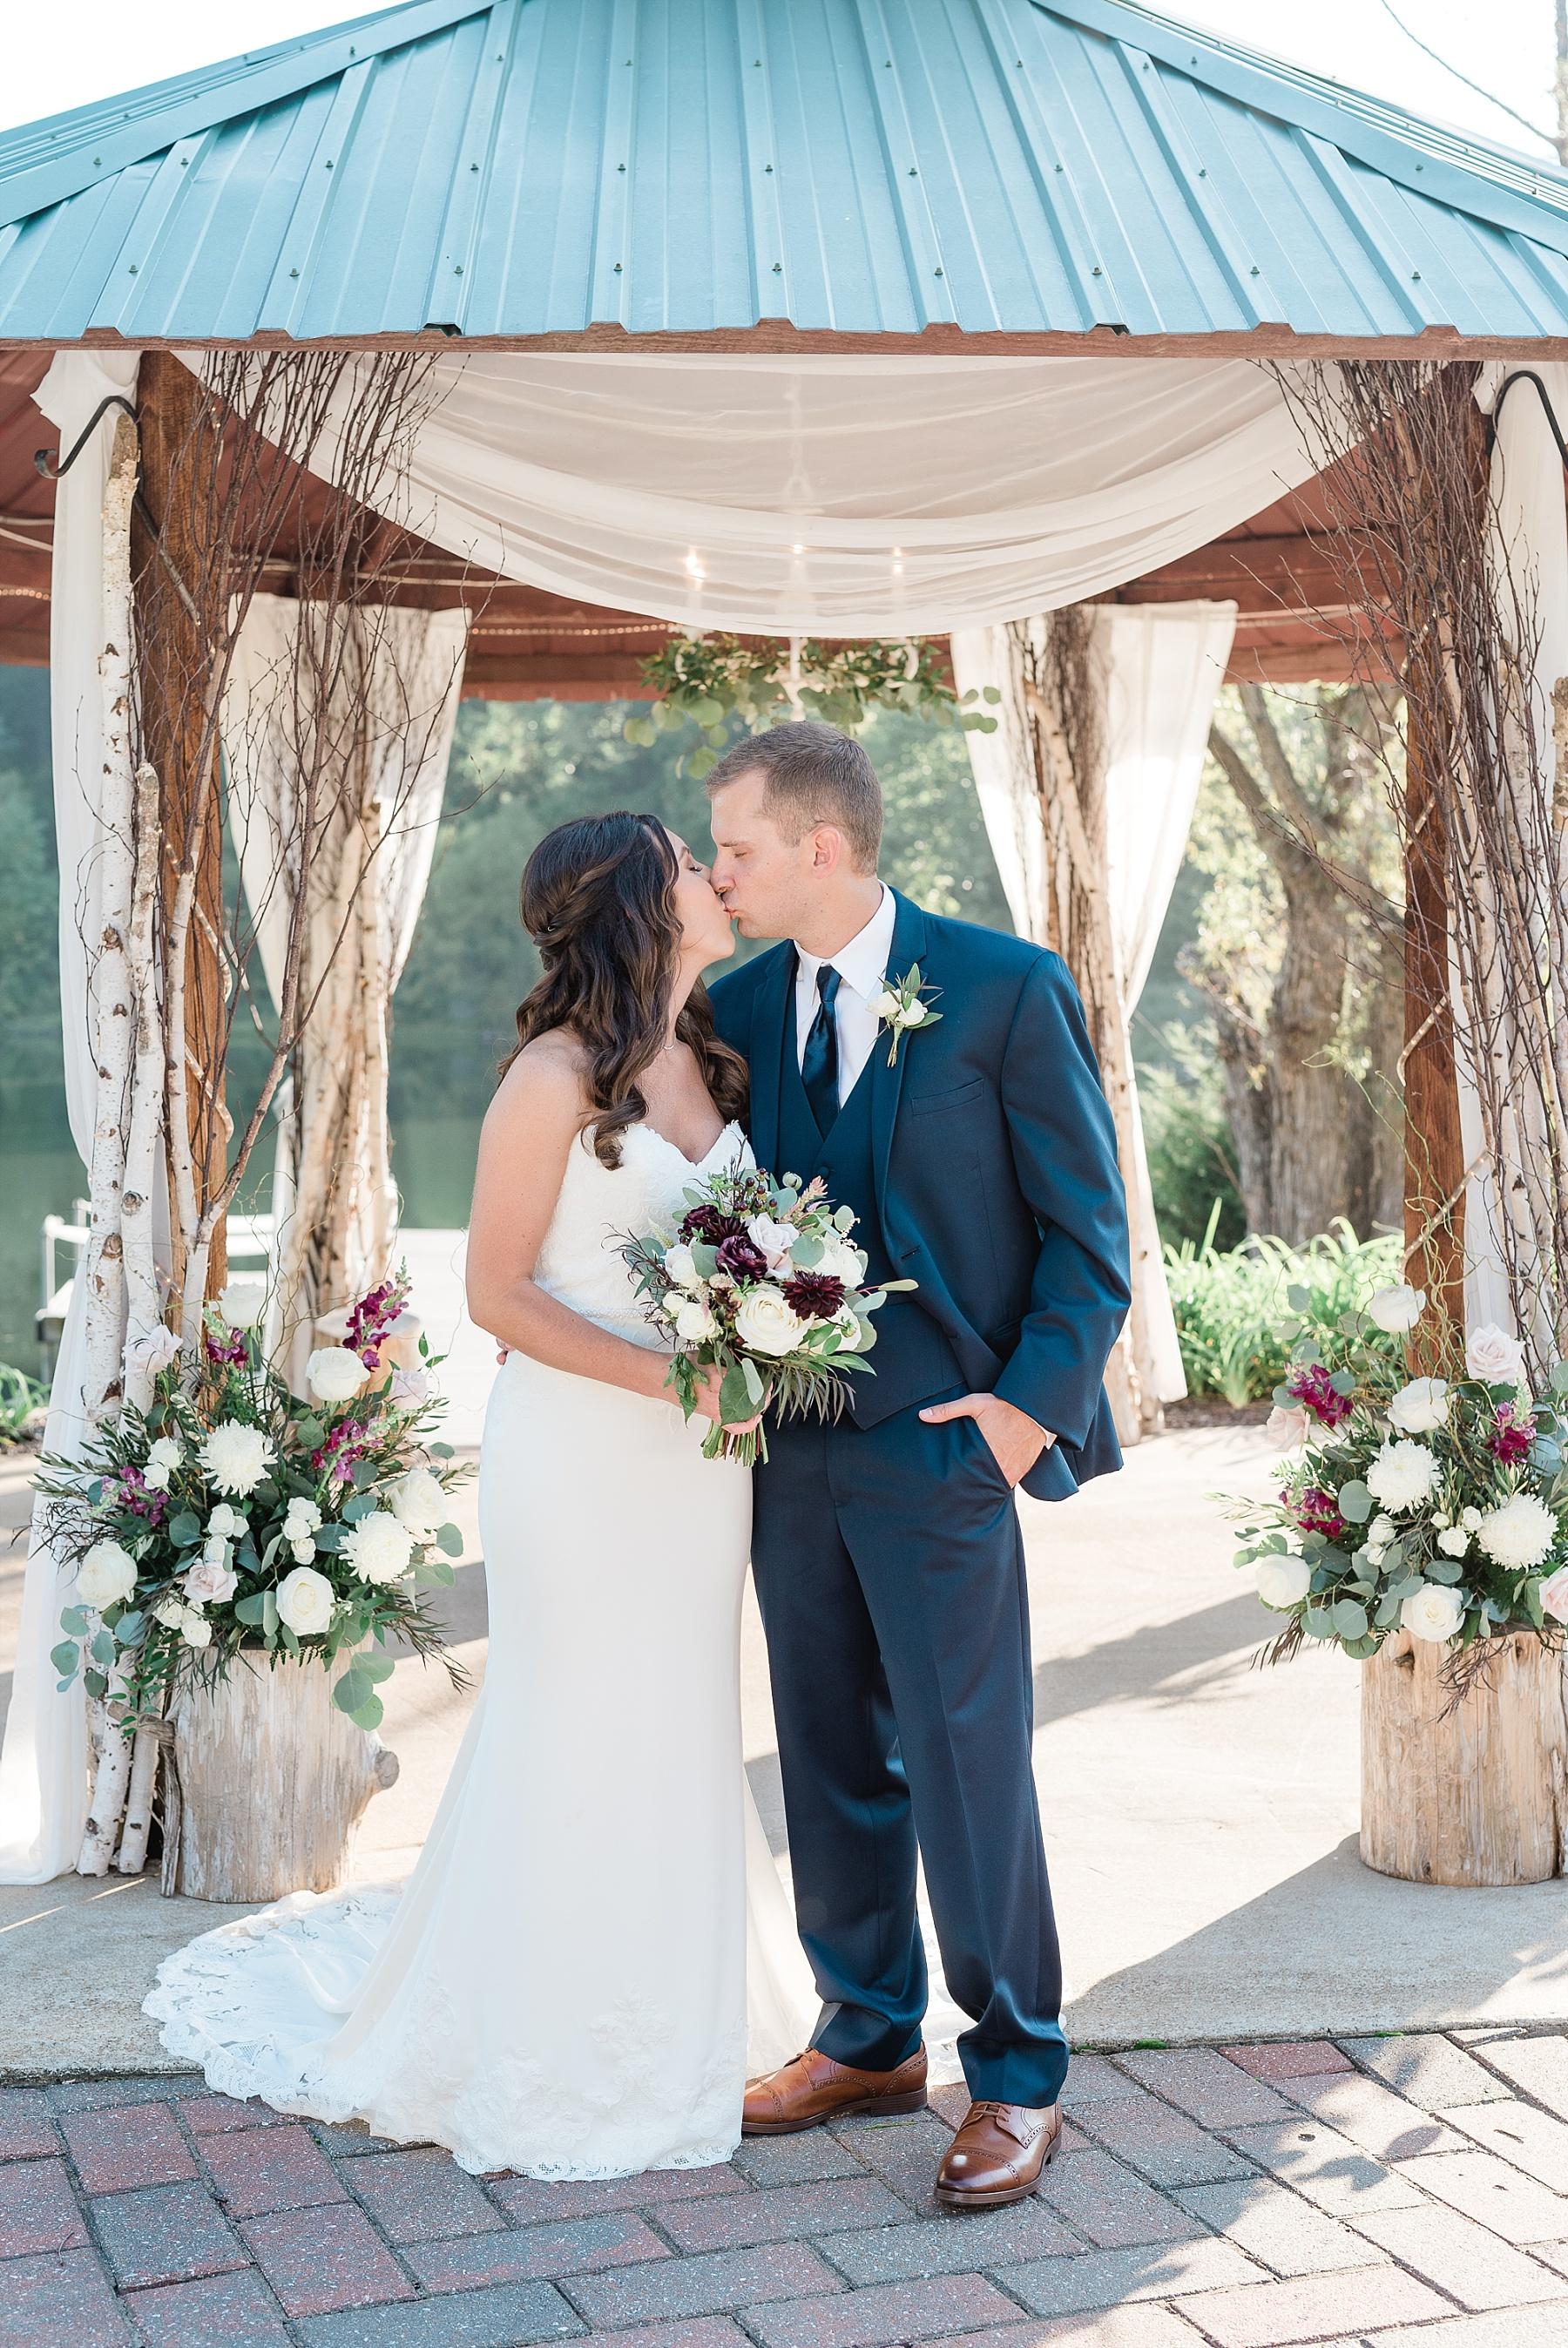 Romantic Summer Sunset Wedding Ceremony at Little Piney Lodge St. Louis Missouri by Kelsi Kliethermes Photography Fine Art Photographer_0039.jpg